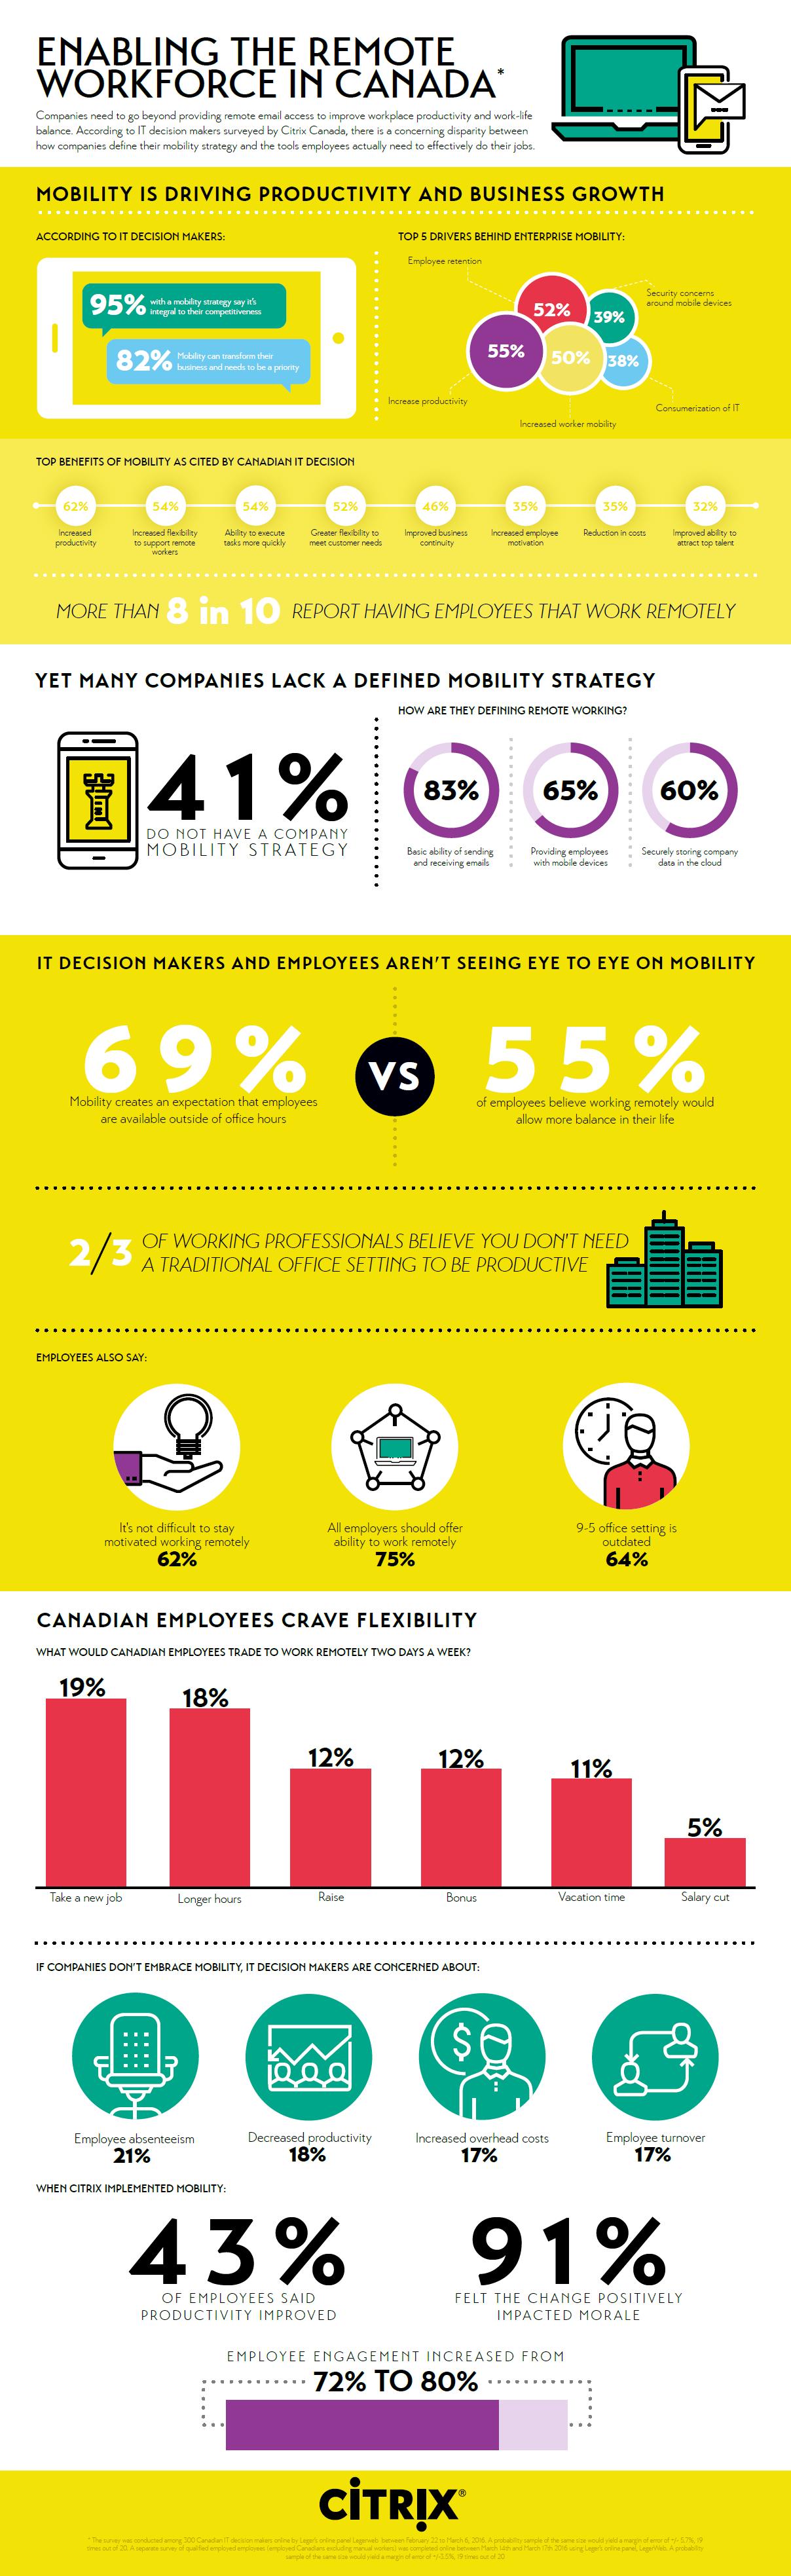 Remote workforce infographic